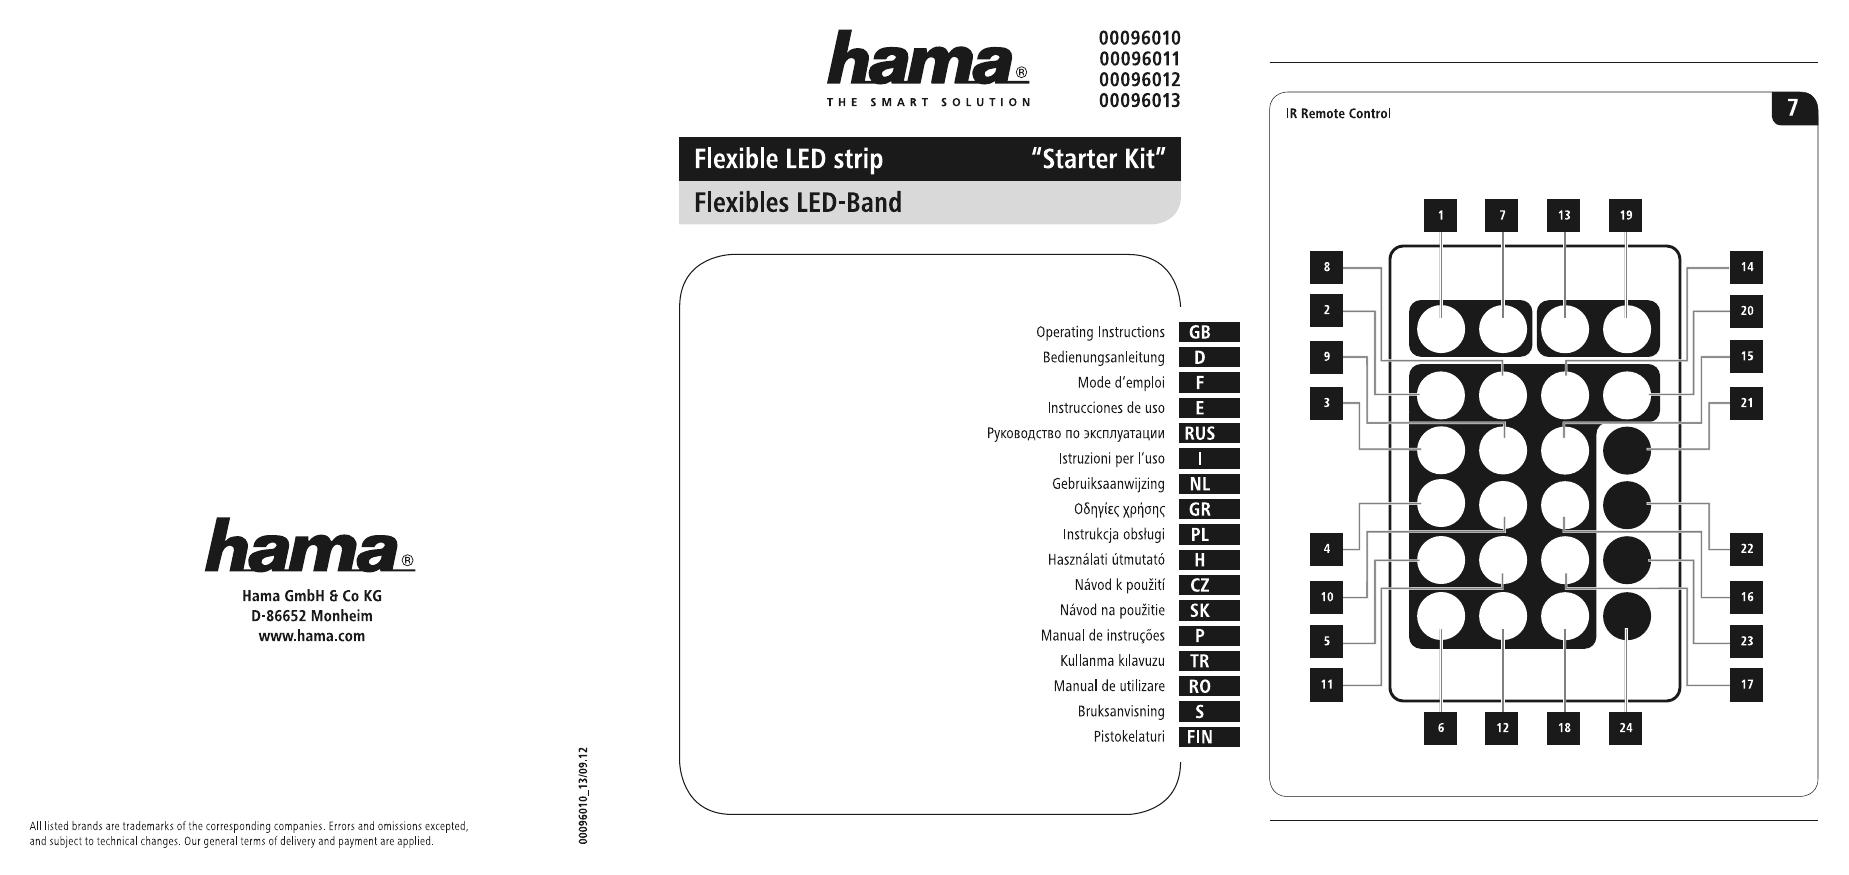 Hama 00096013 Flexible LED Strip RGB, extension set, 2.5 m